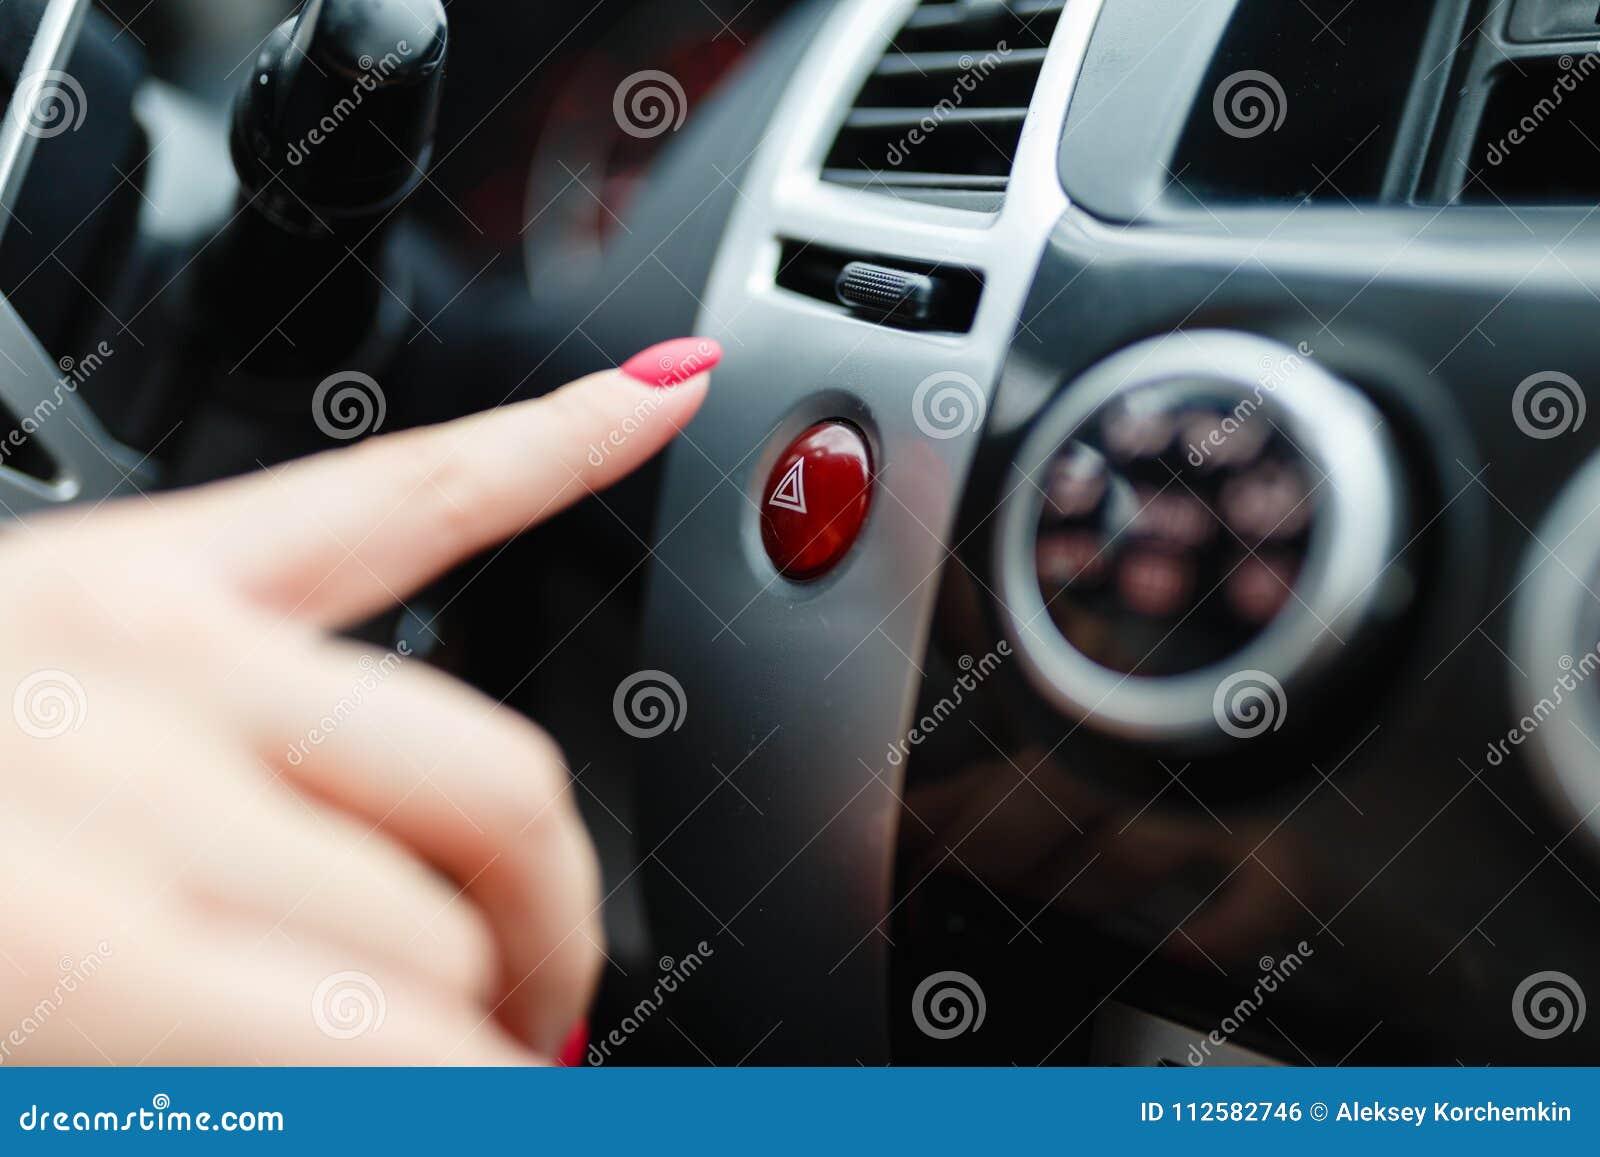 Female Hand Presses Button To Turn Alarm Car Emergency Lighting Shot Finger Woman Pressing Dashboard on Car Alarm Wiring Guide